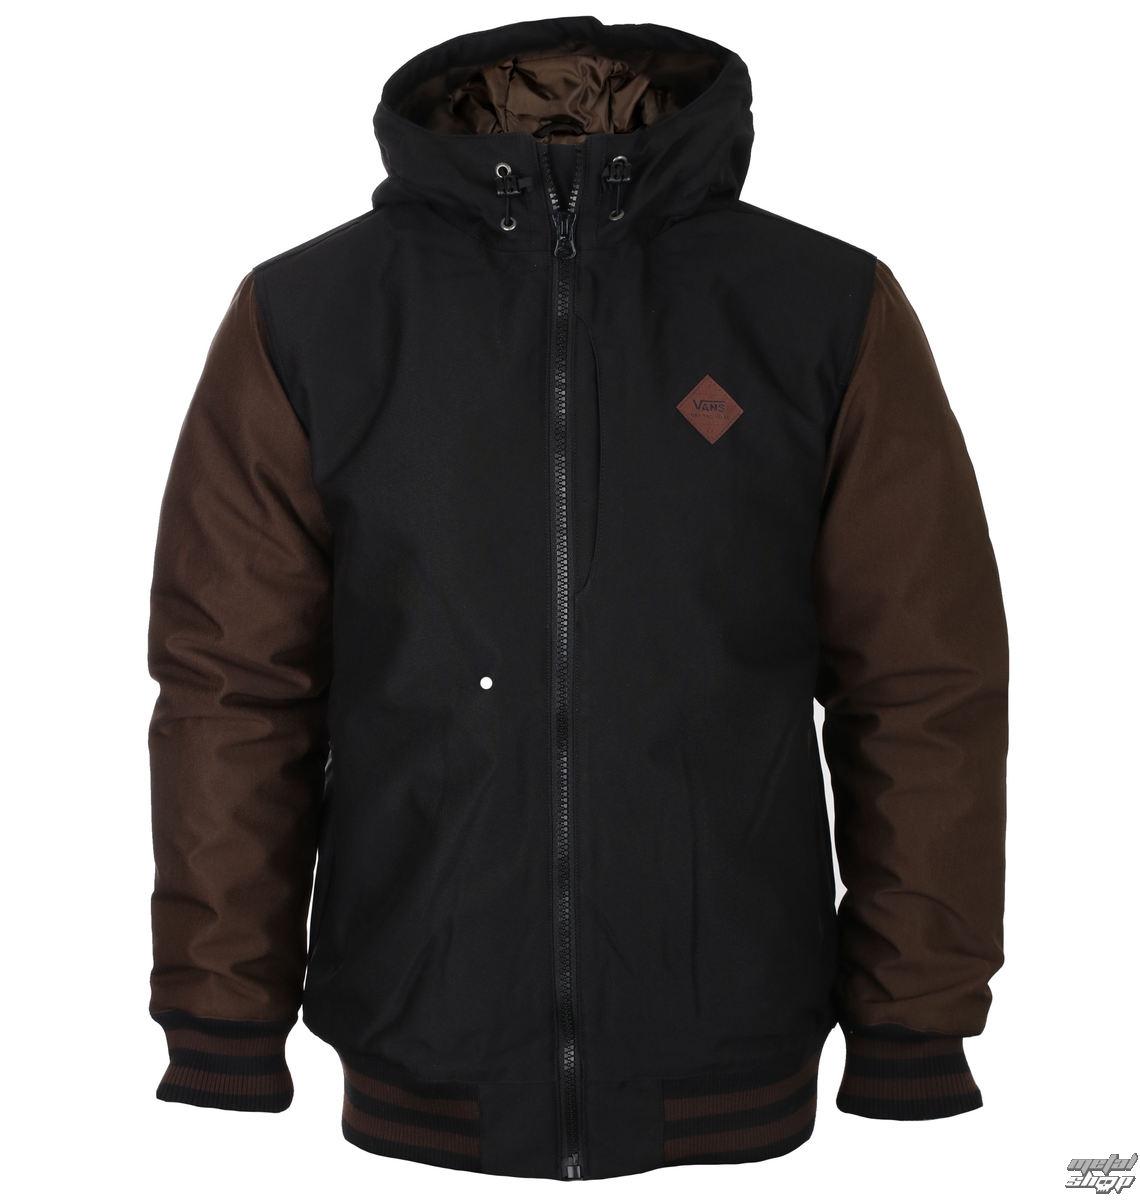 6f22faa576 bunda pánská zimní VANS - RUTHERFORD - MTE BLACK DEMITA - VA36JYO5X -  metal-shop.eu